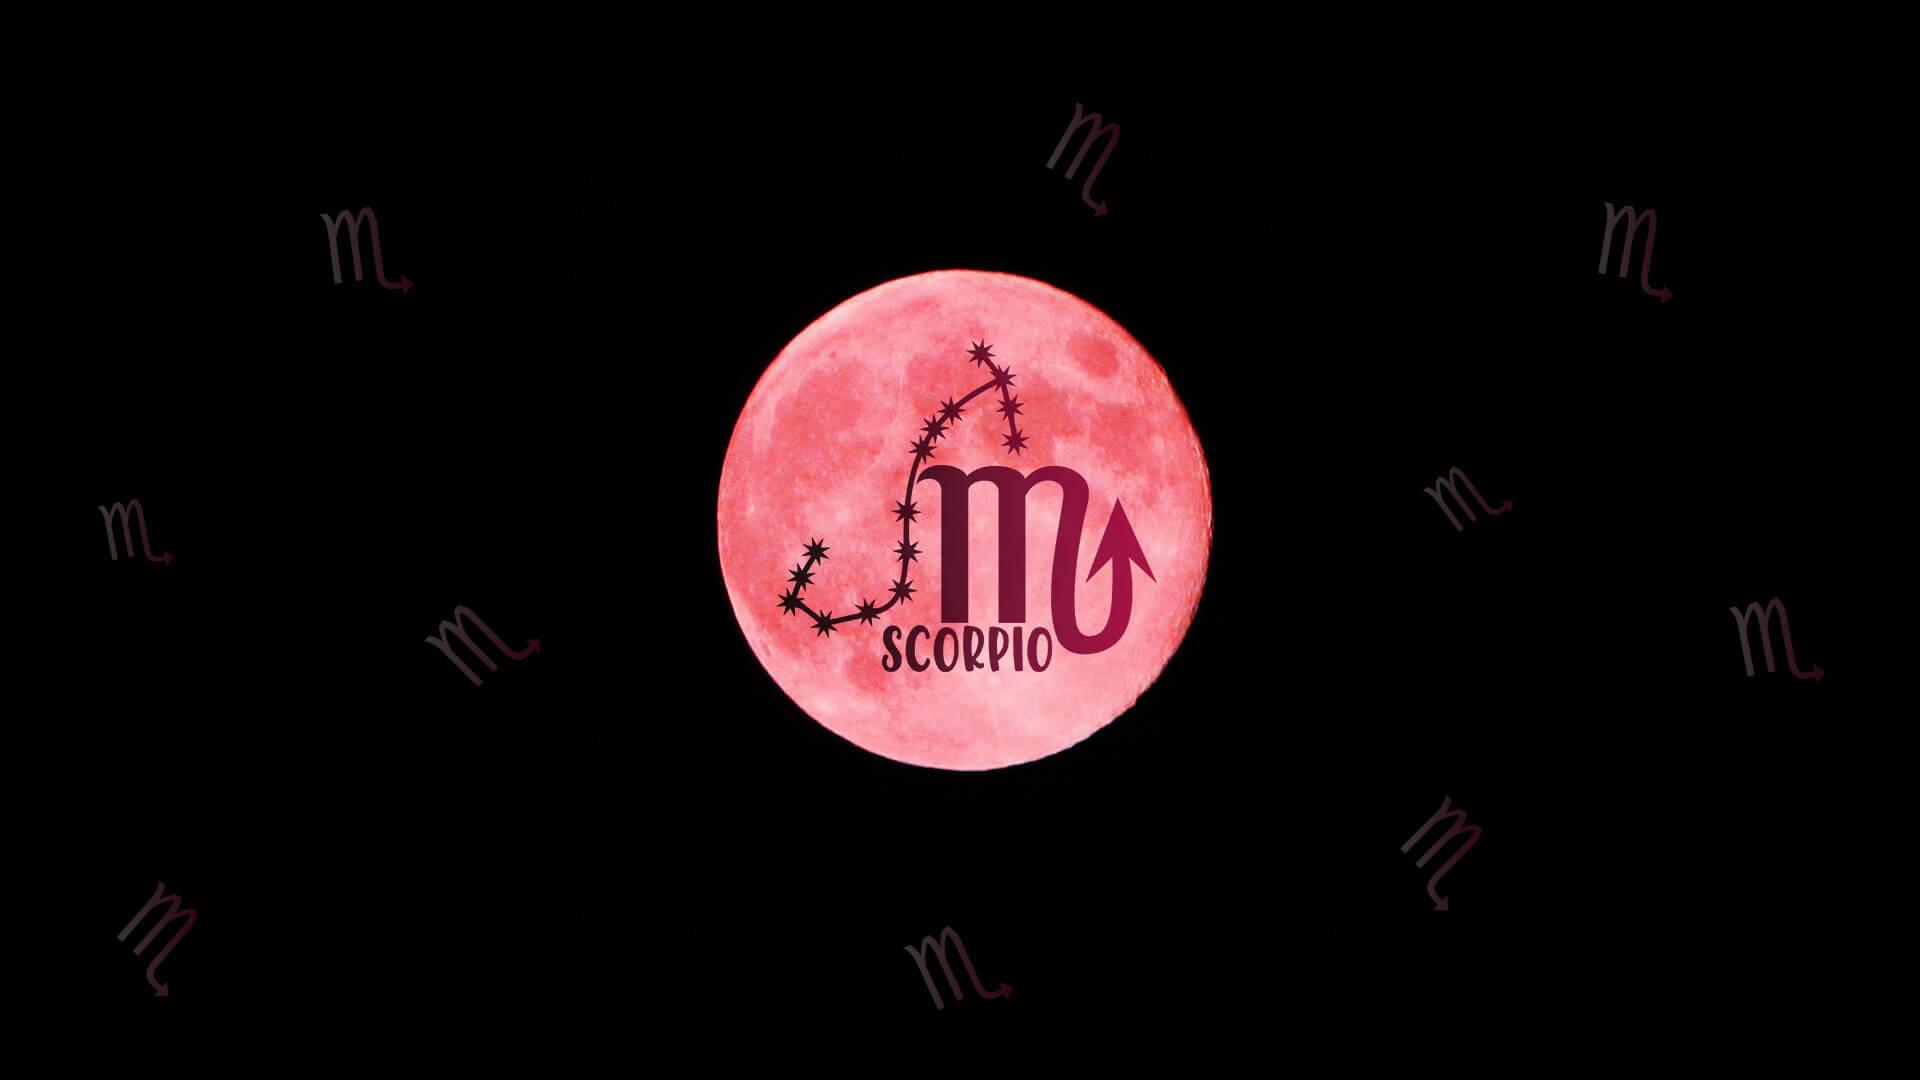 Super Full Moon in Scorpio Moon Omens April 26 2021